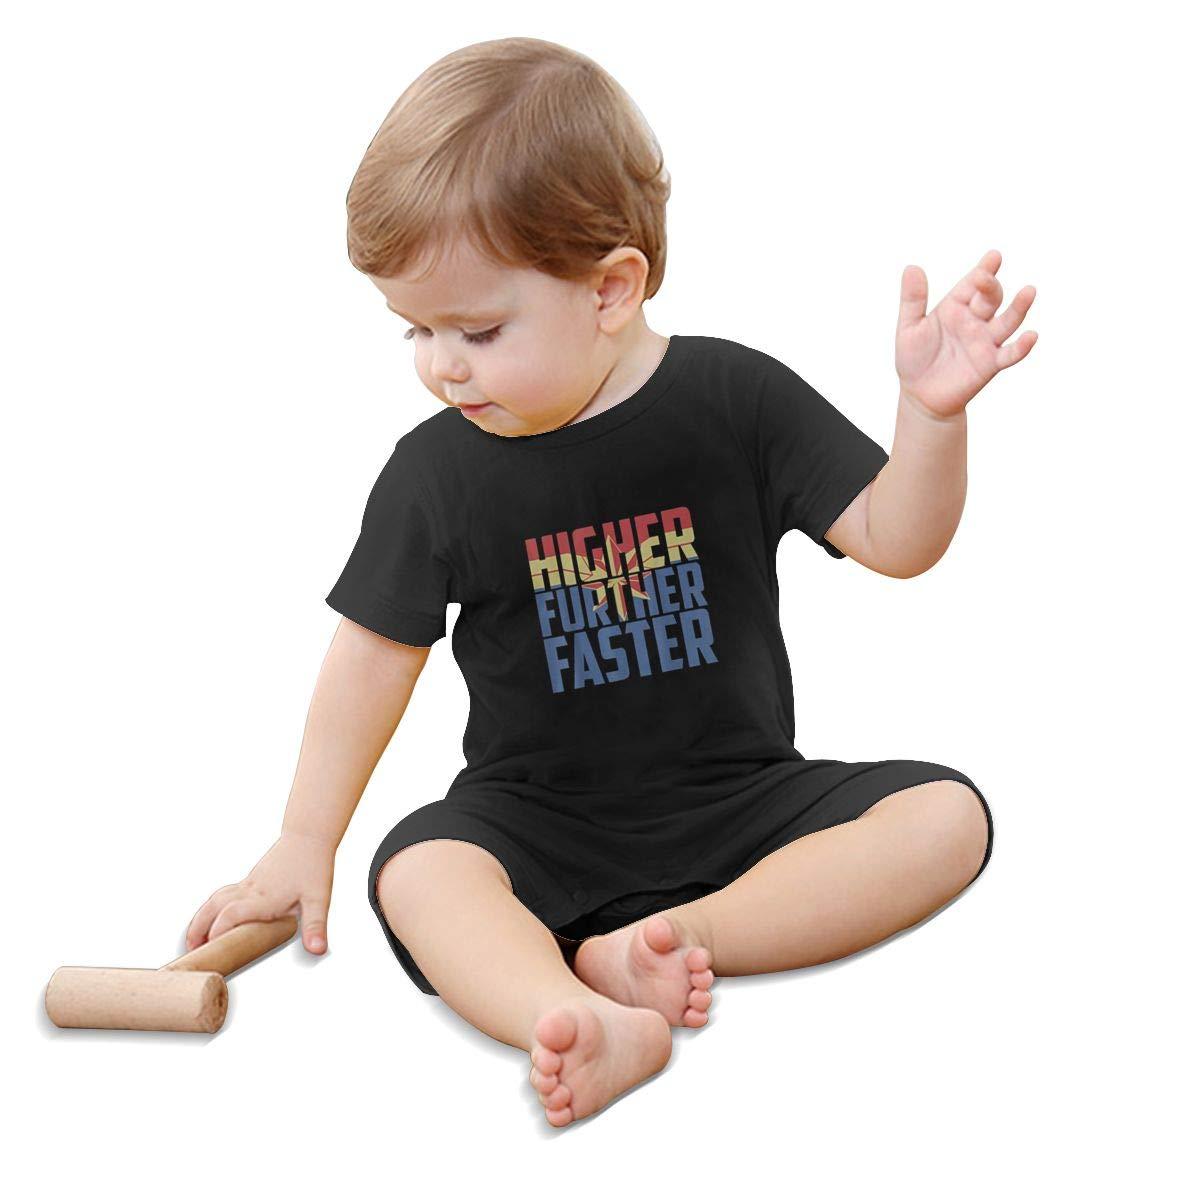 61lmZuck-4L Generic Kids Cute Short Sleeve Jumpsuit